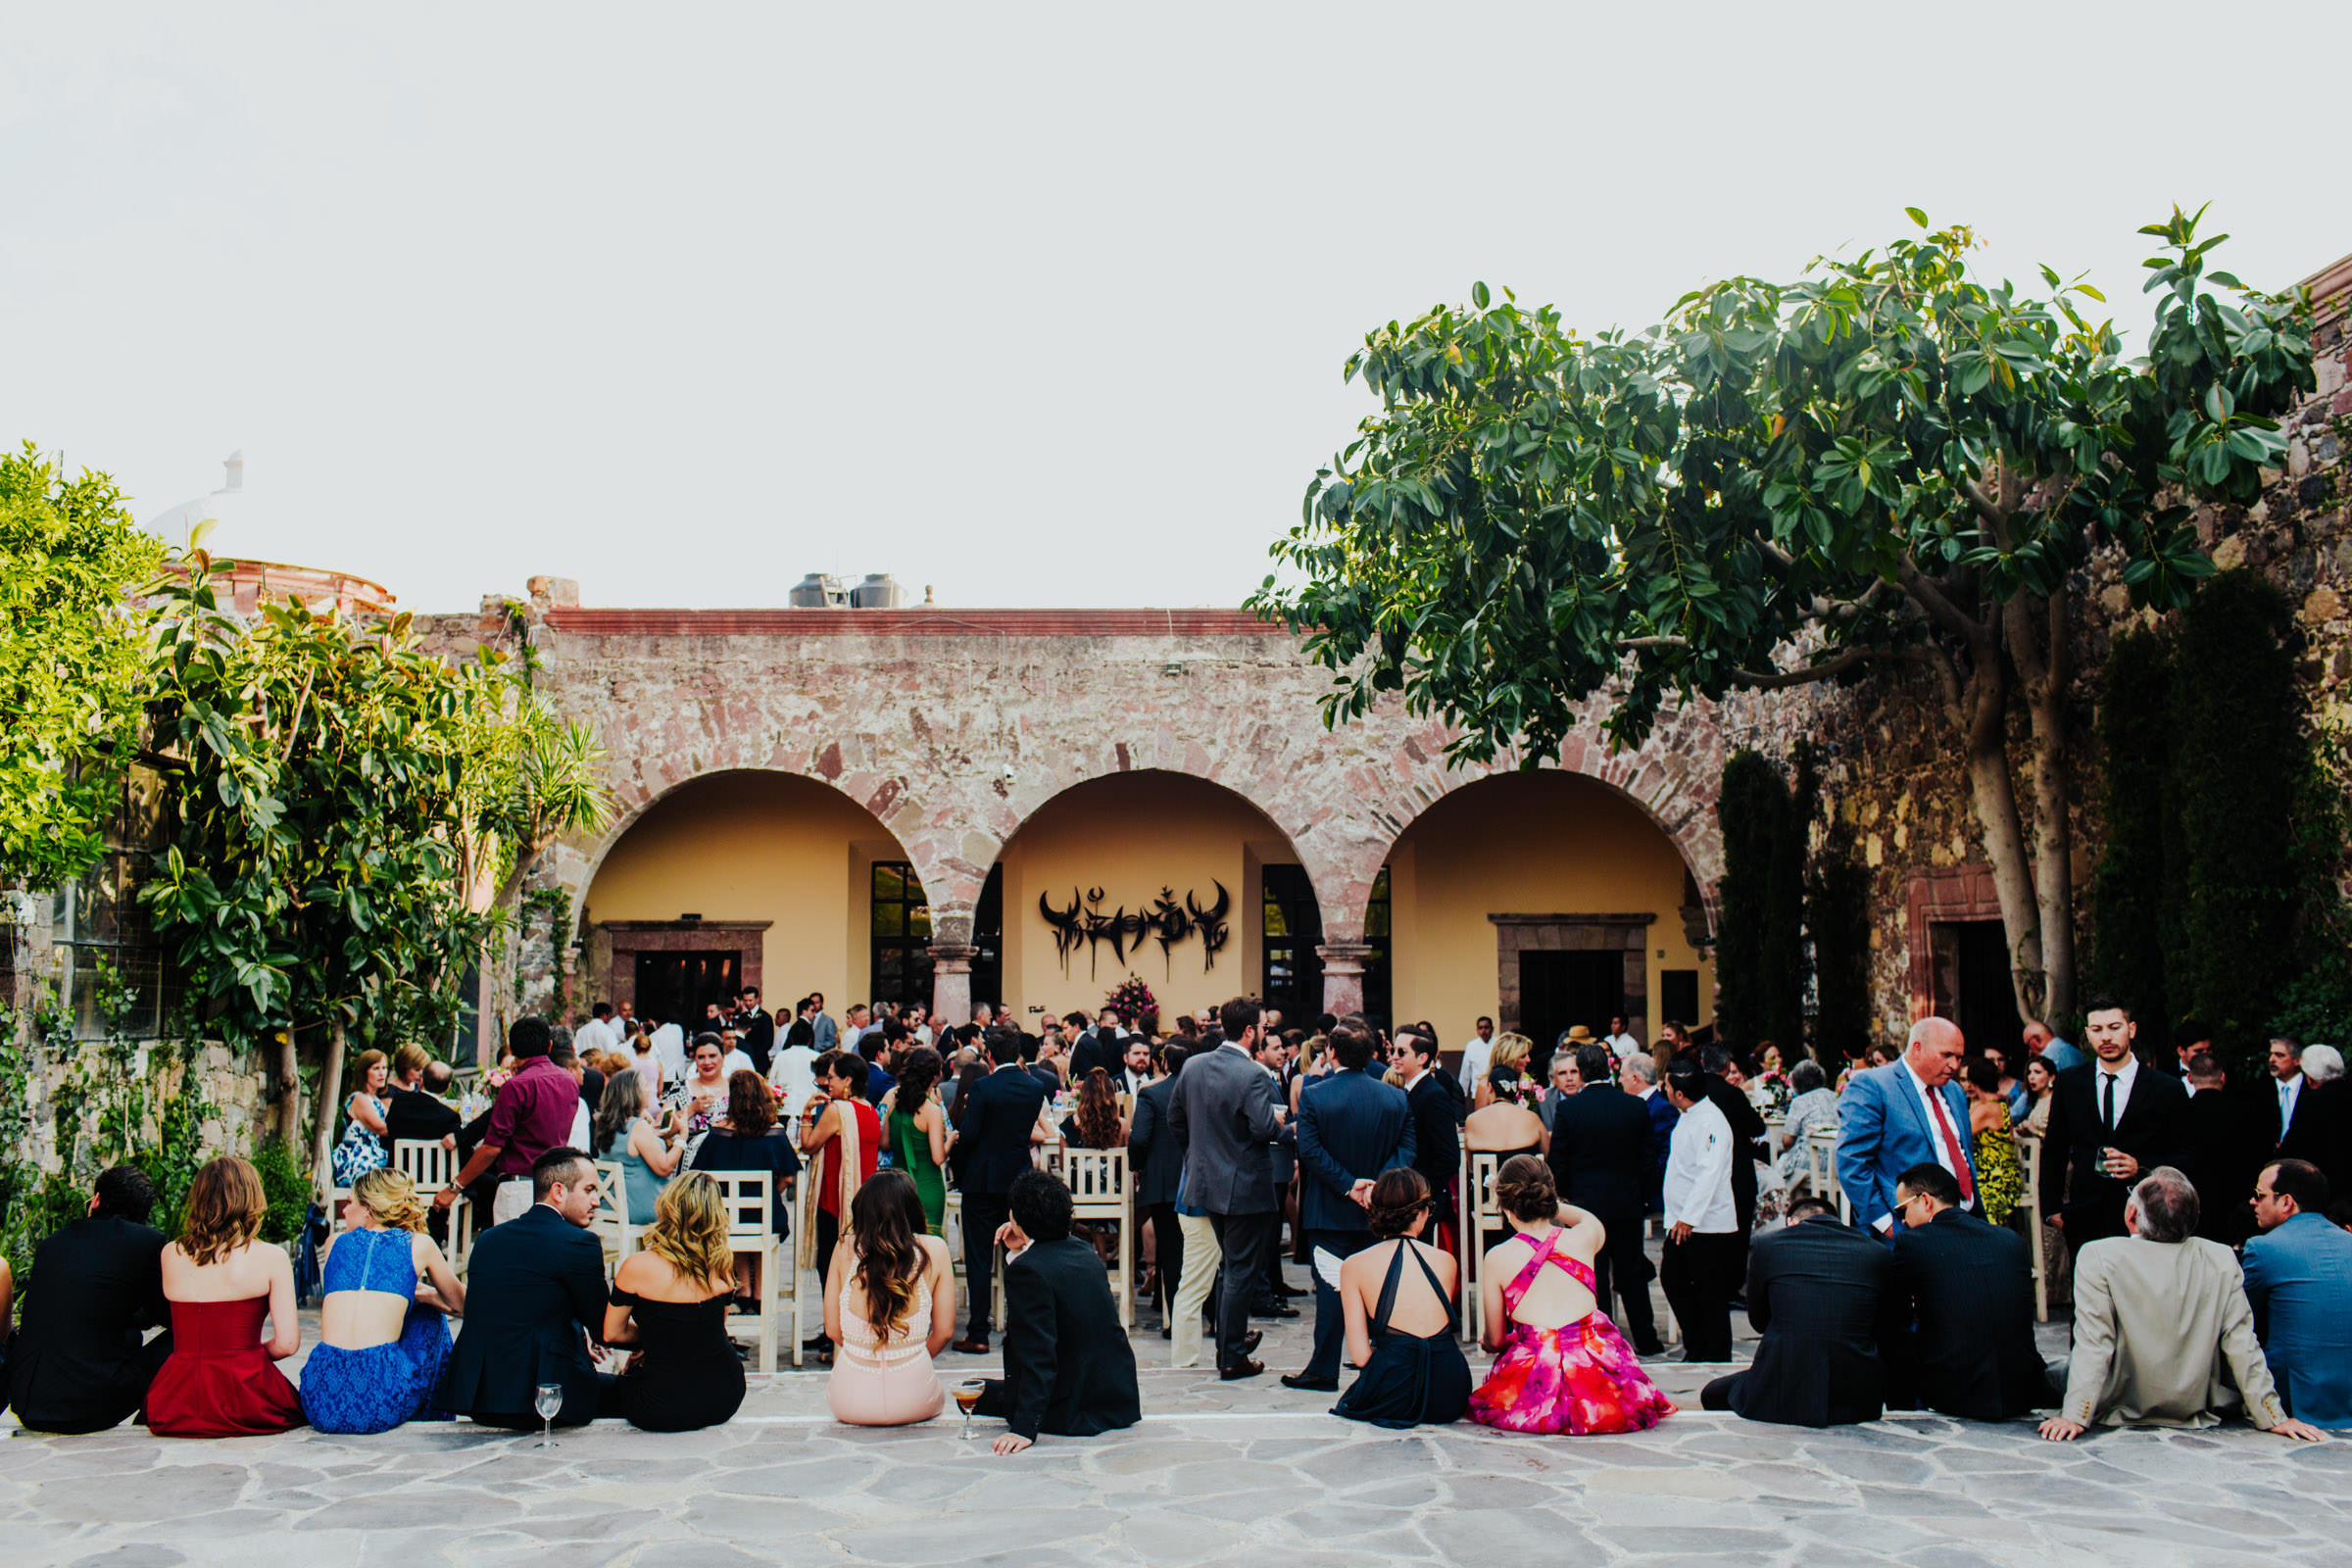 San-Miguel-de-Allende-Wedding-Photography-Parroquia-Instituto-Boda-Fotografia-Fer-Sergio-Pierce-Lifestyle-Photography0008.JPG